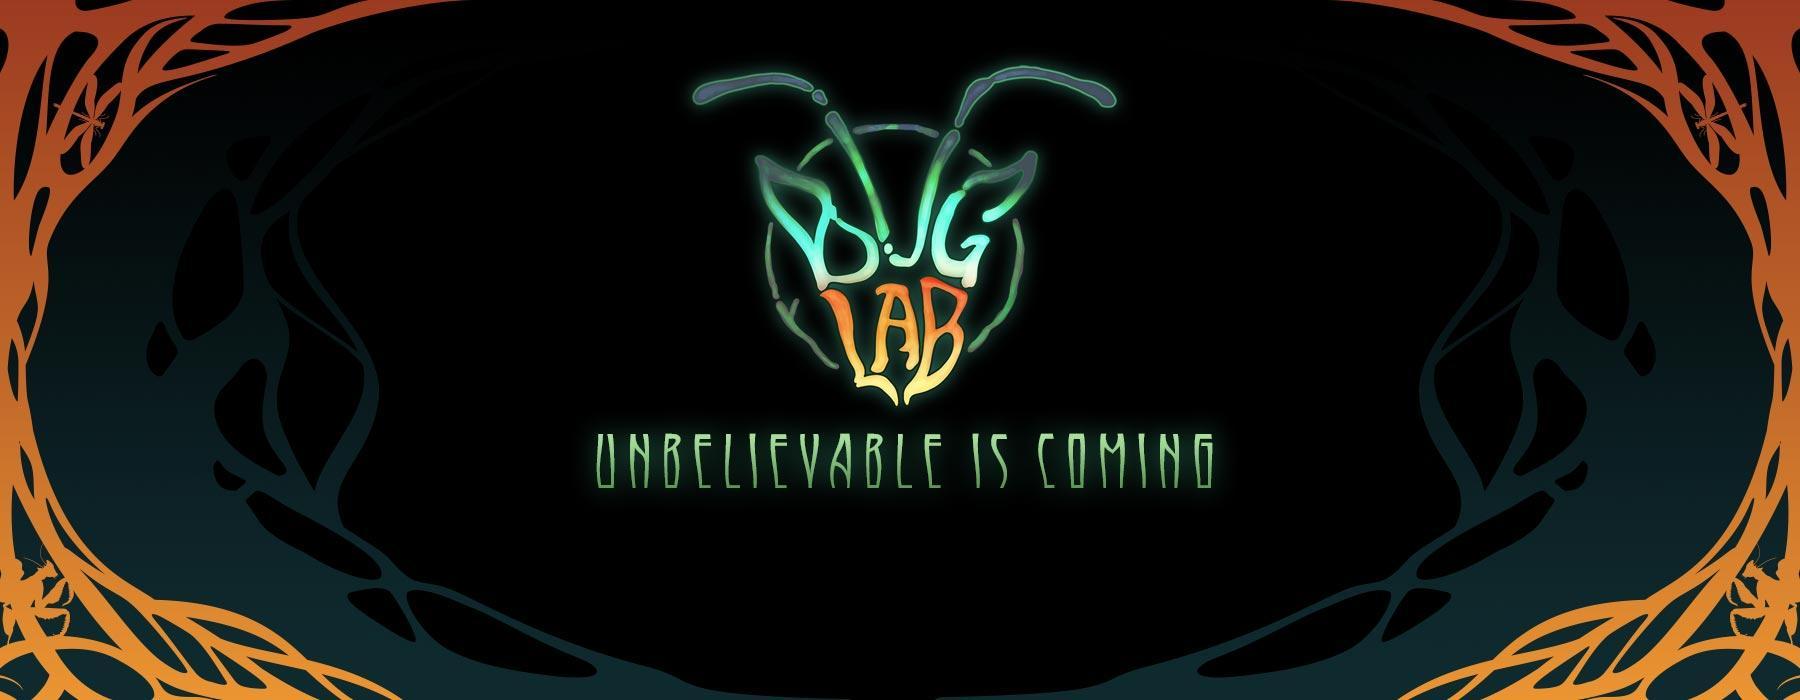 An art deco design borders a logo with looks like a bug's head but says 'Bug Lab'